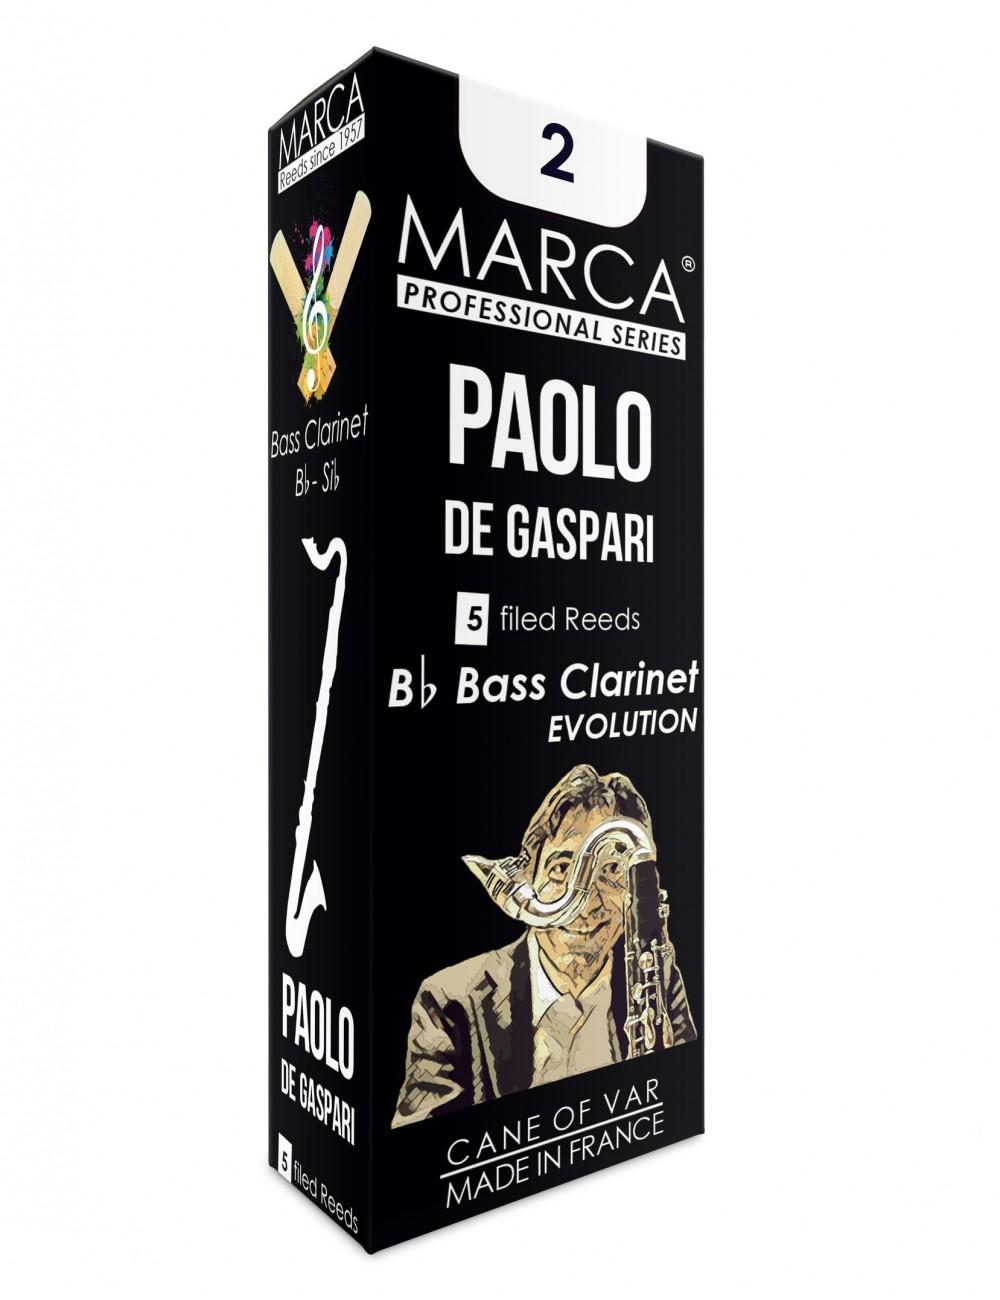 5 REEDS MARCA PAOLO DE GASPARI BASS CLARINET 2